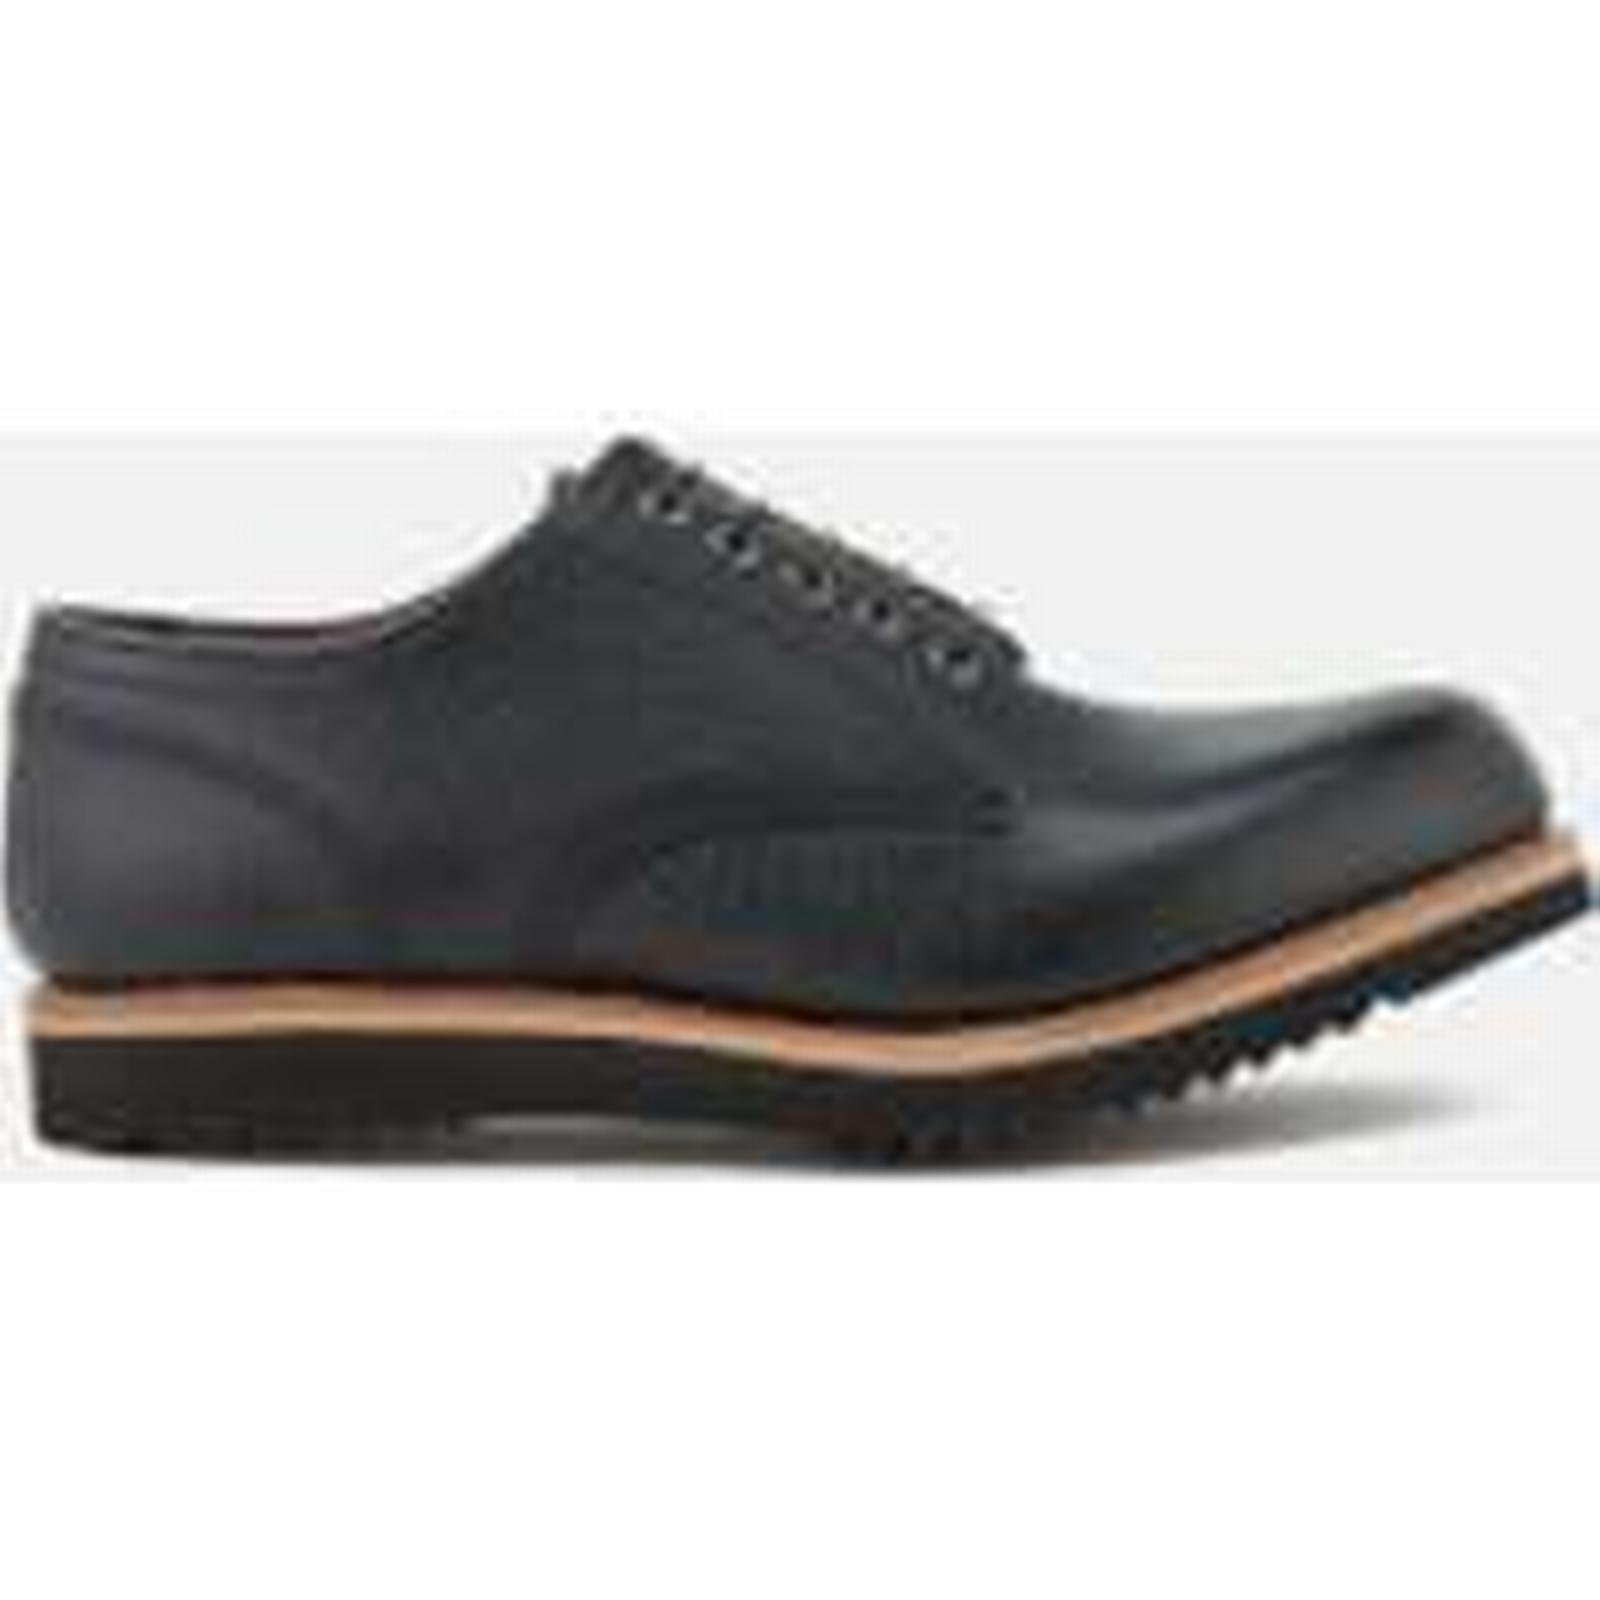 Grenson Men's Drew Grain Leather Derby UK Shoes - Black - UK Derby 8 - Black ee9b05